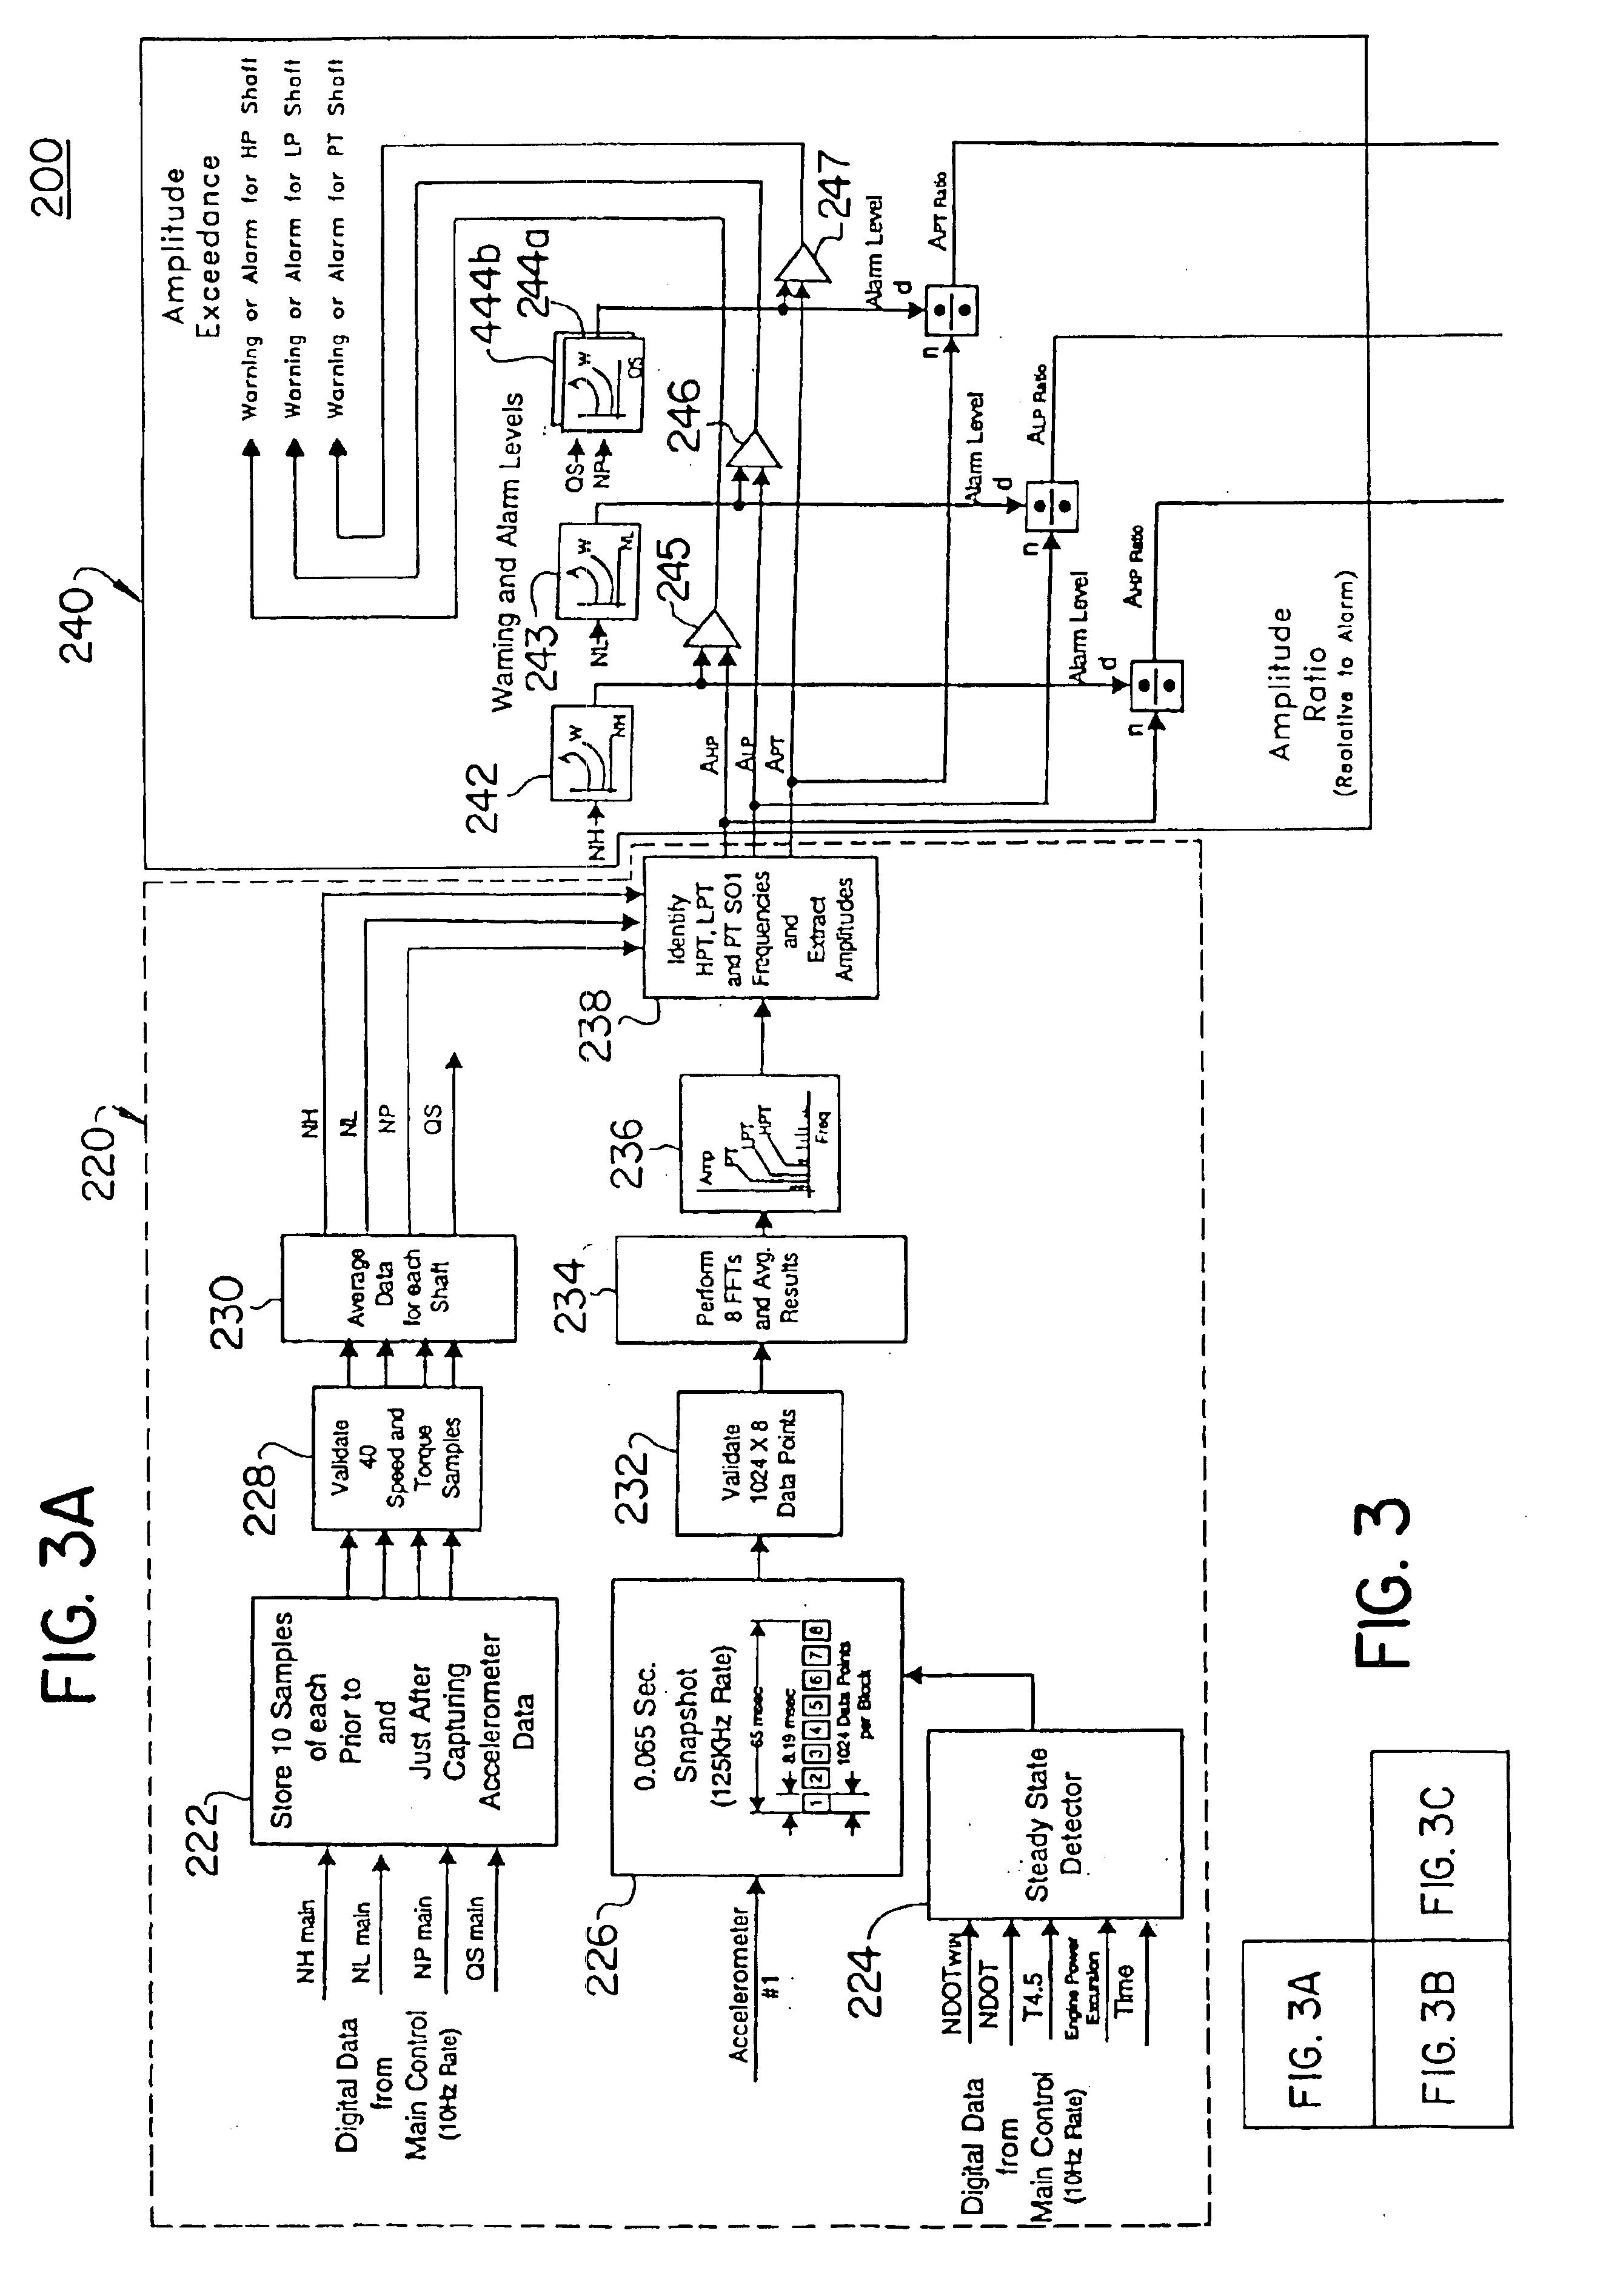 Turbine Engine Vibration Monitoring Systems : Patent us vibration monitoring system for gas